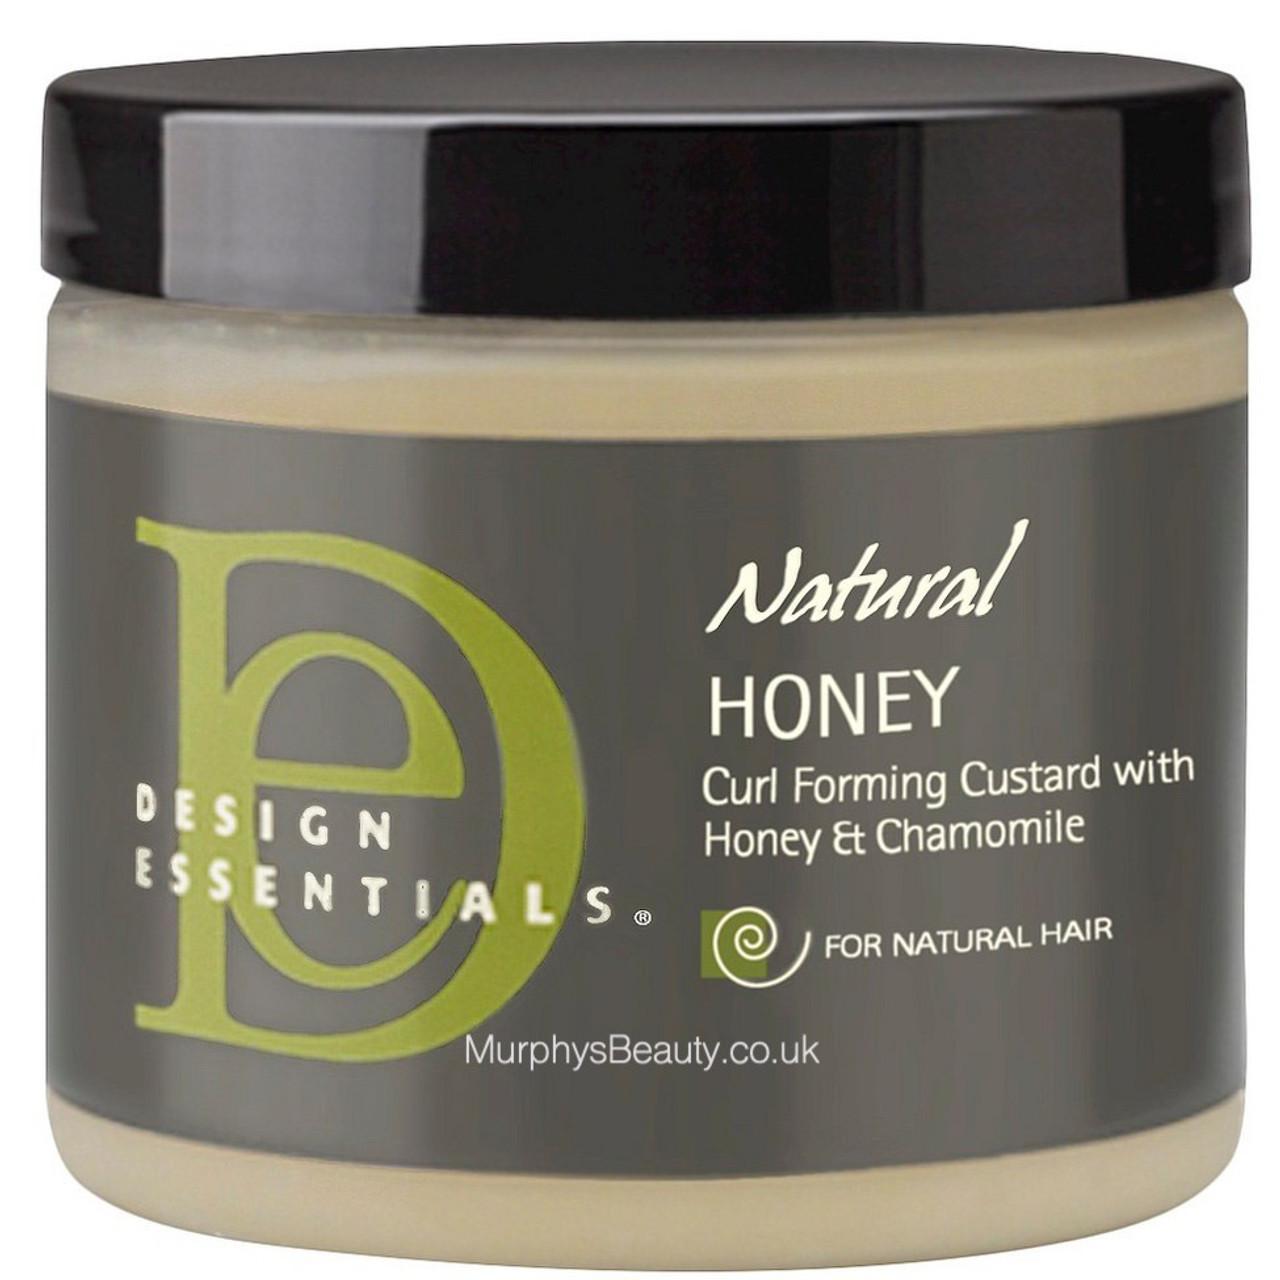 Design Essentials Almond Avocado Honey Curl Forming Custard 8oz,Simple Background Design For Birthday